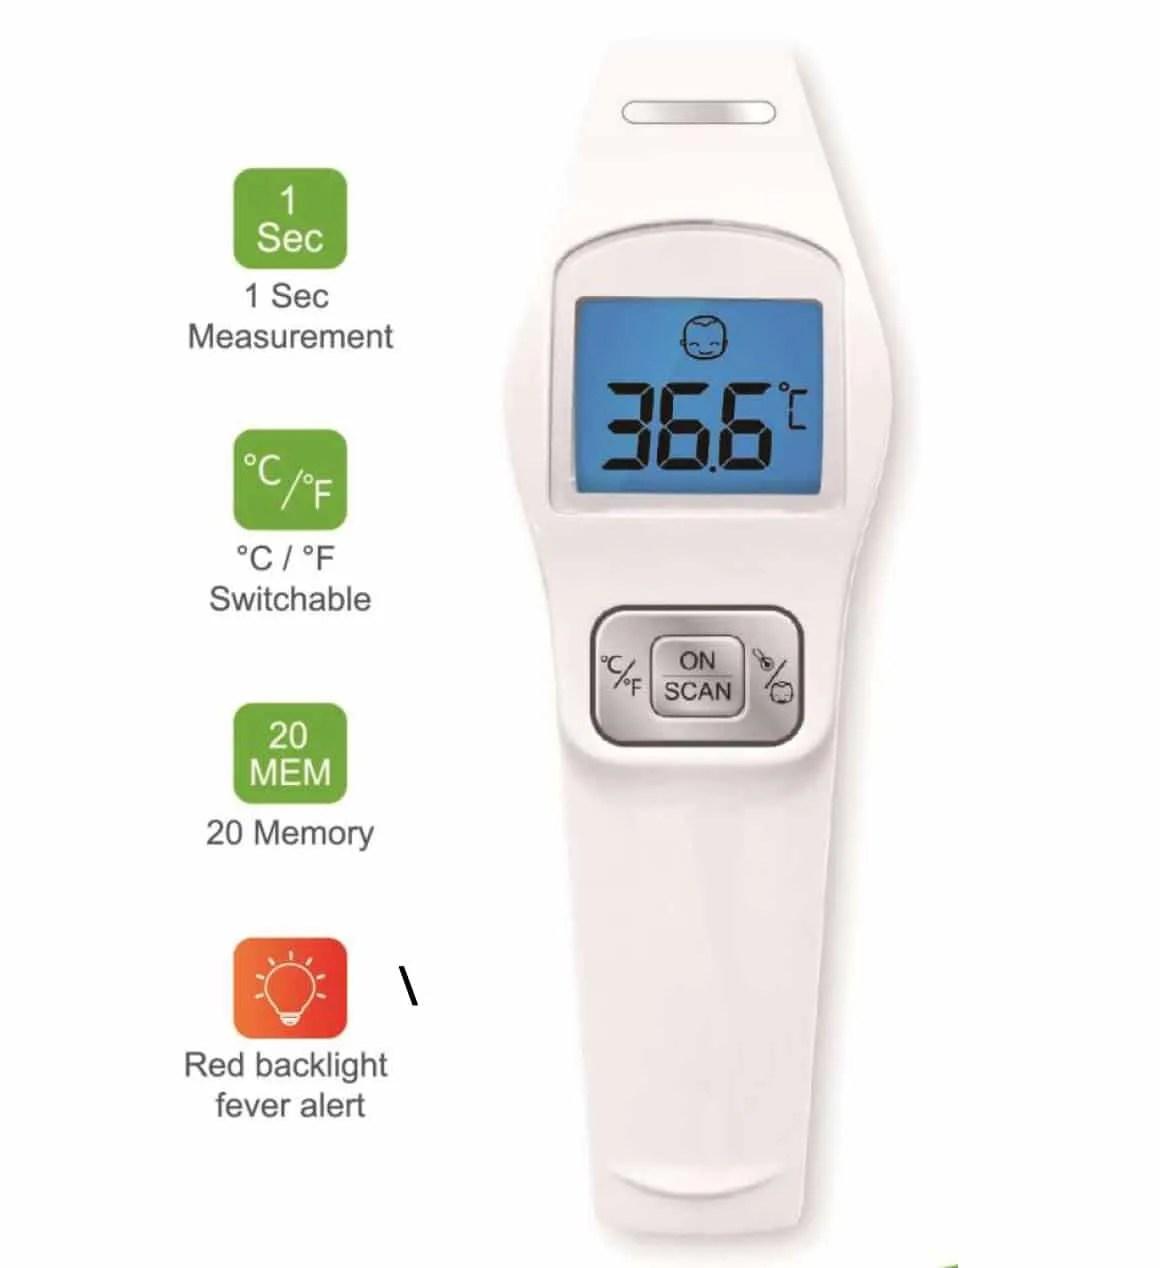 Termometro-infrarossi-VIVAGUARD-FT-100C